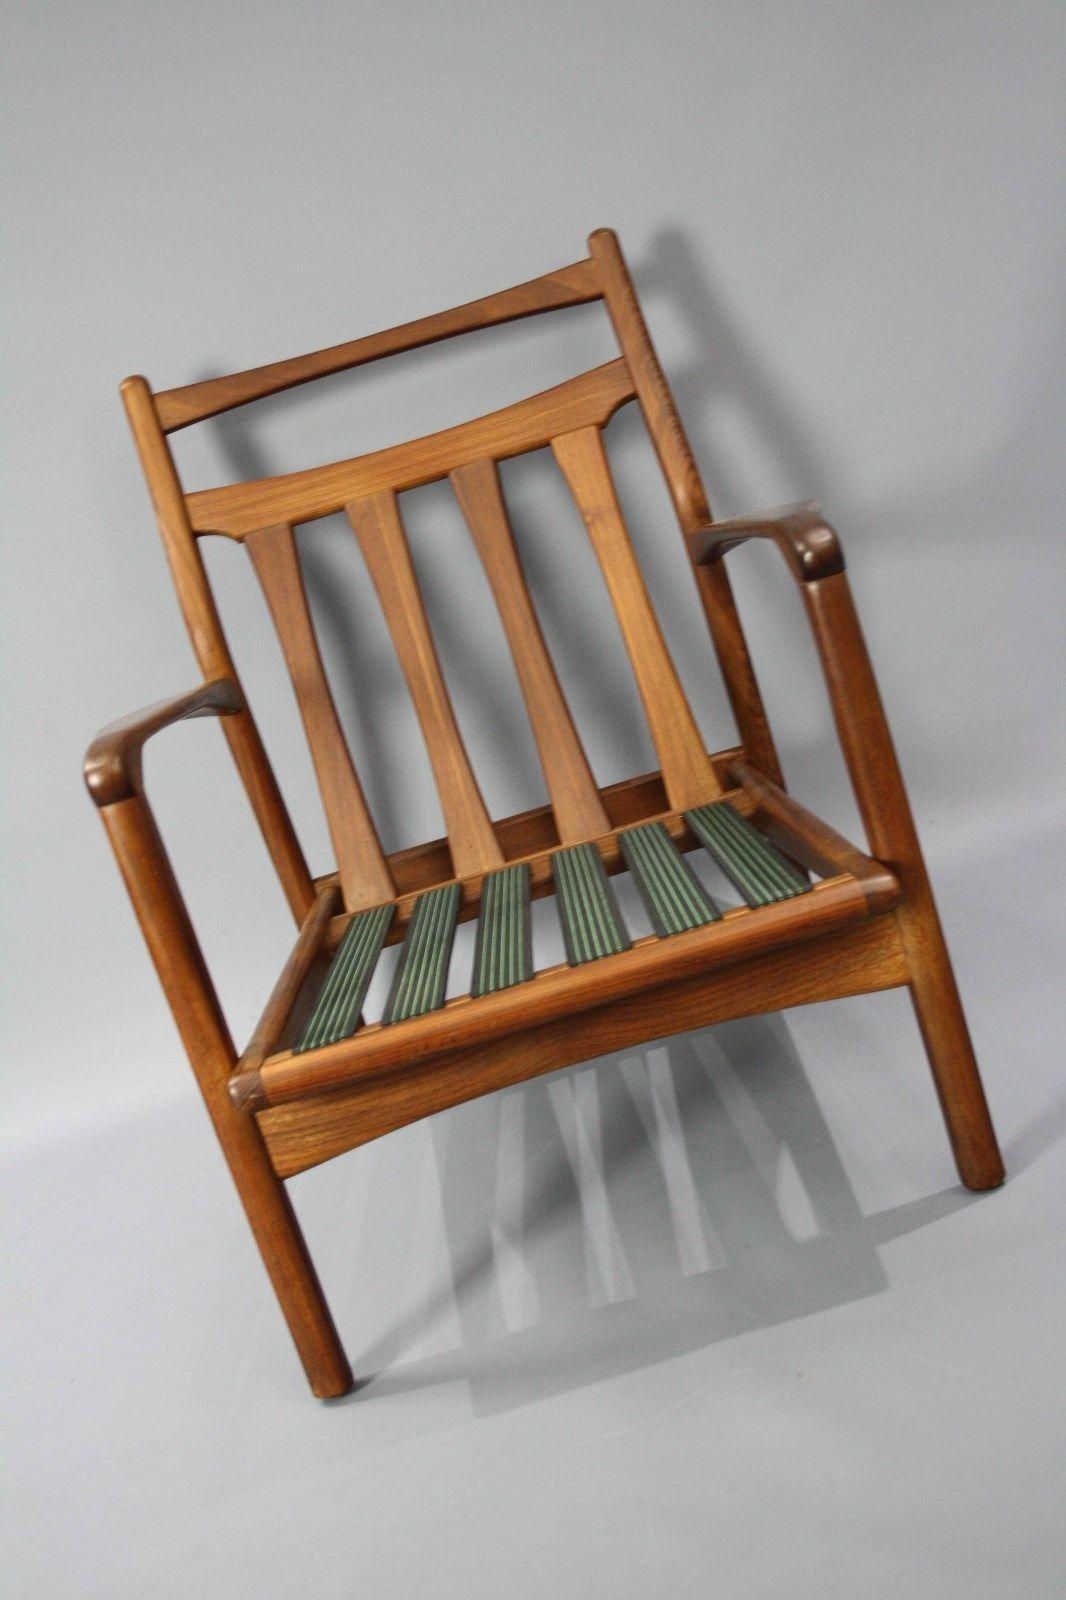 Mid Century Toothill Heals Uk Original Teak Armchair Retro Vintage Lounge Chair Danish Era 360 Modern Furniture Vic Ebay